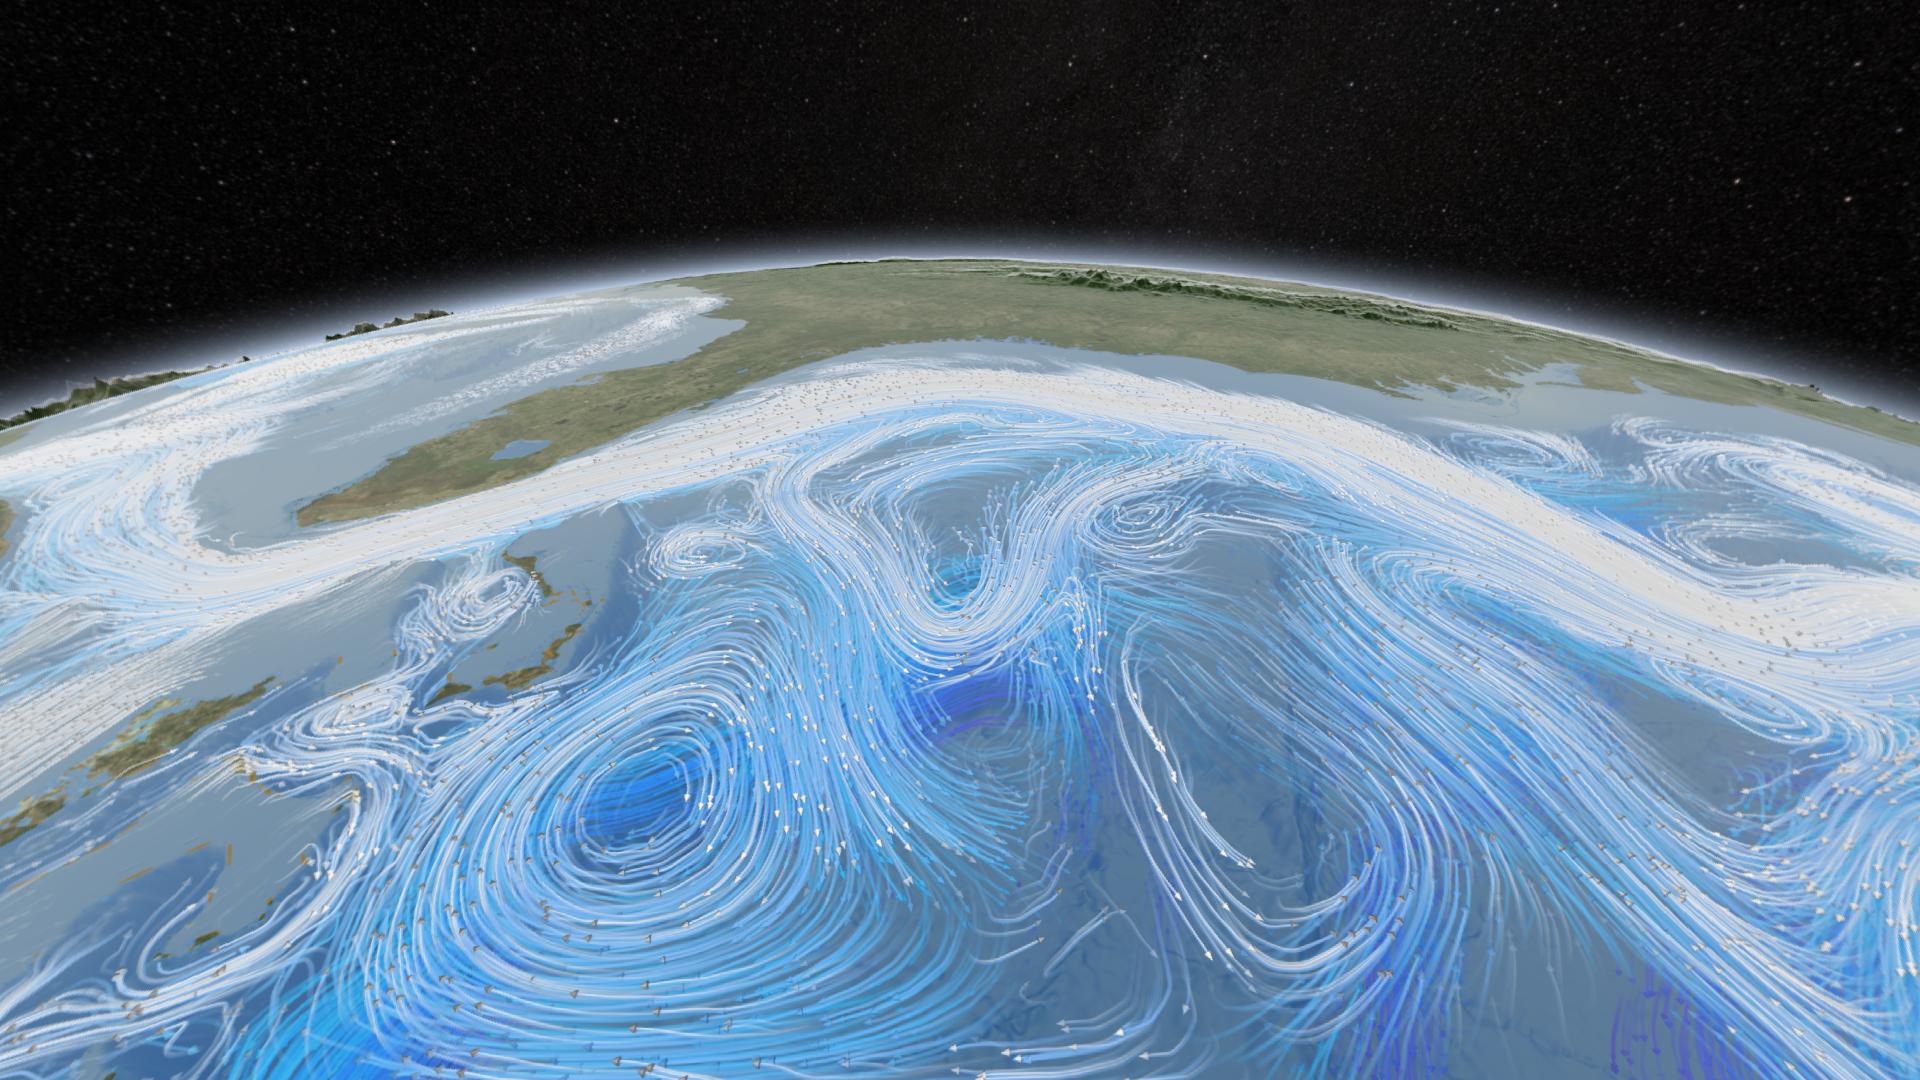 (Credit: NASA/ Goddard Scientific Visualization Studio)